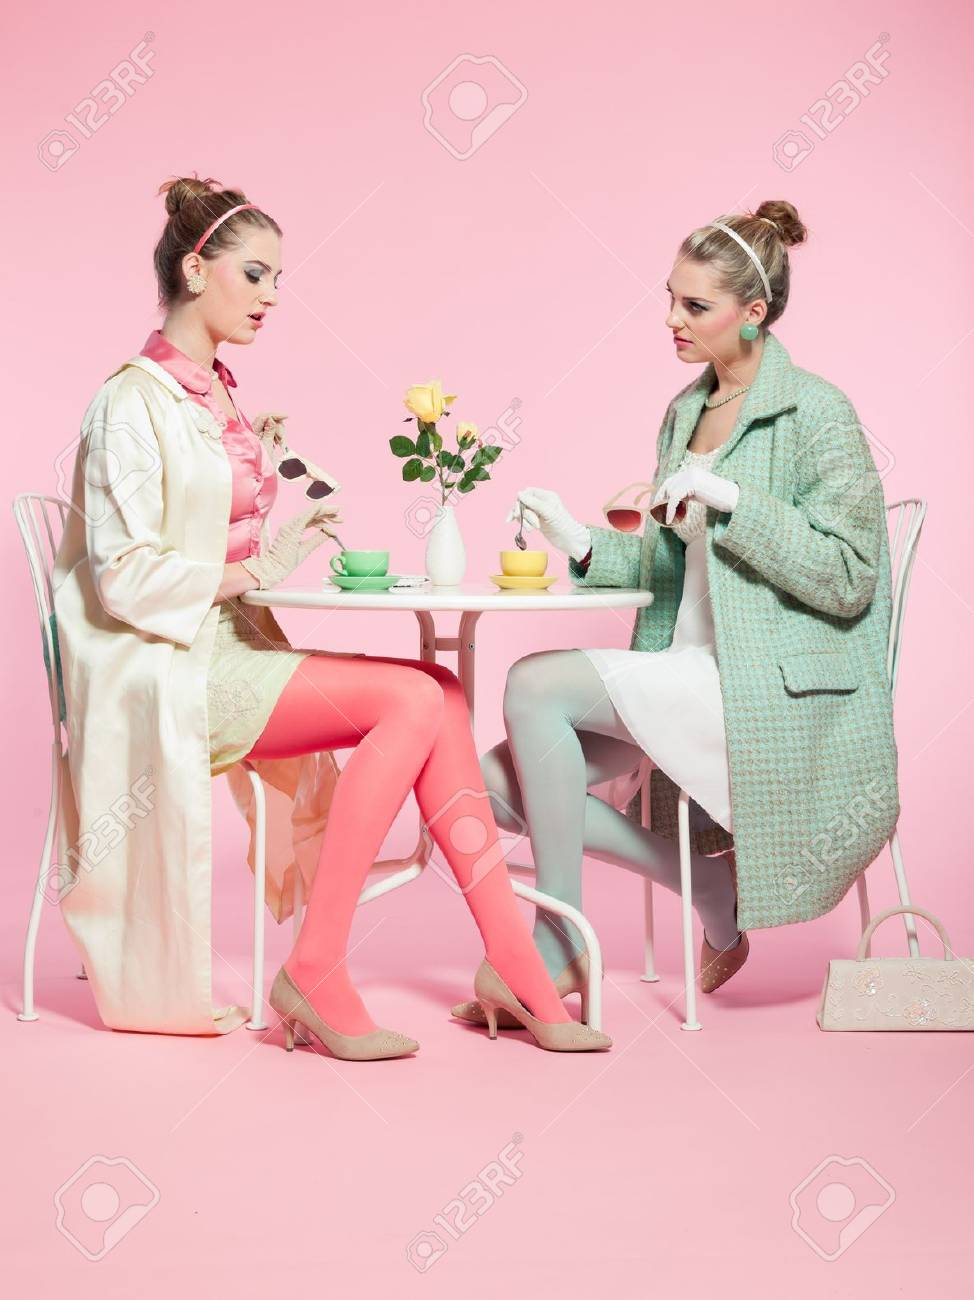 Two girls blonde hair fifties fashion style drinking tea Stock Photo - 18190144